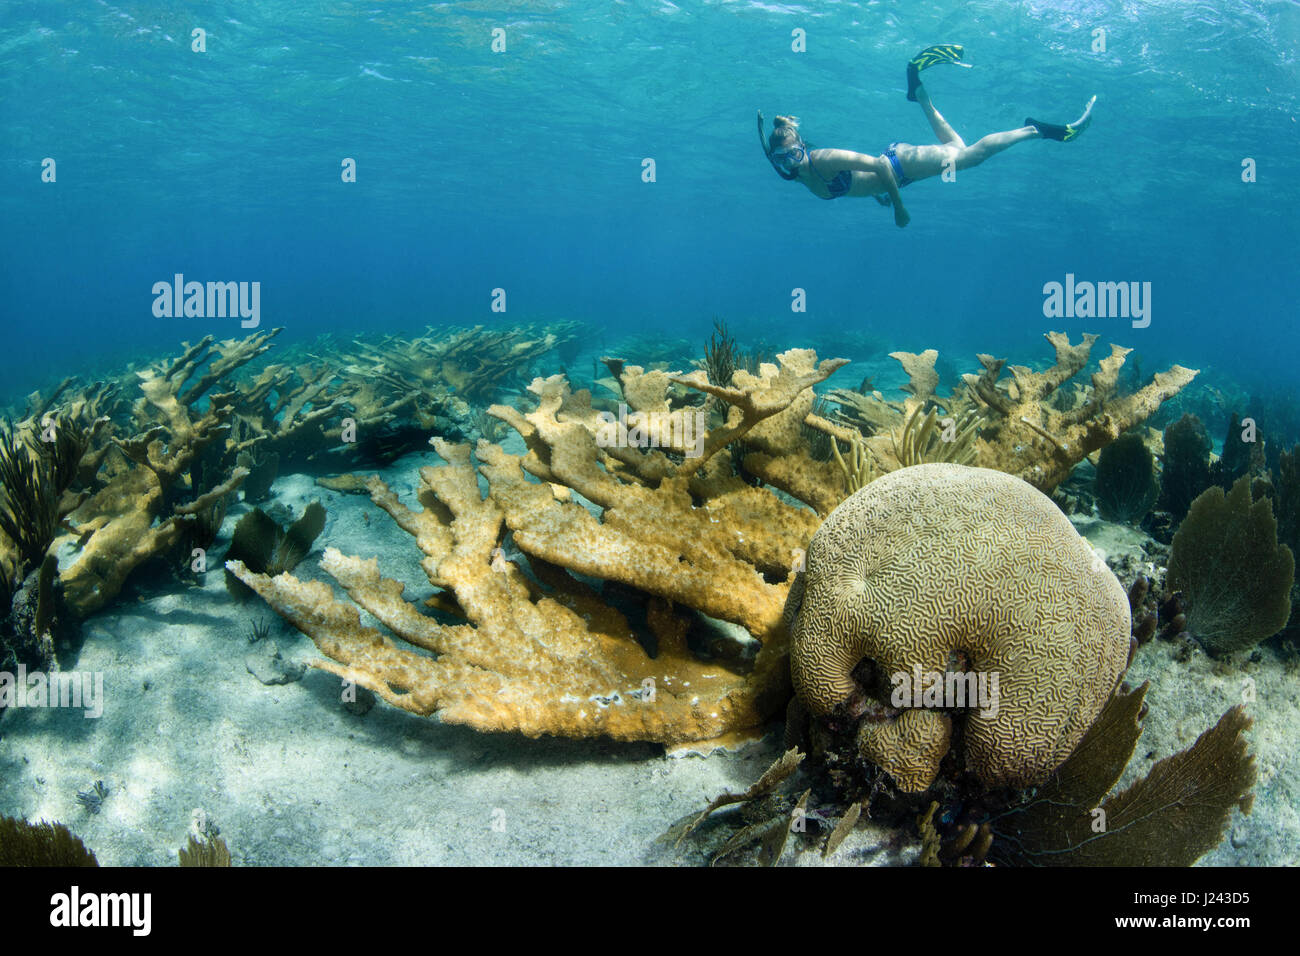 Buceador flota sobre campo de corales duros. Foto de stock